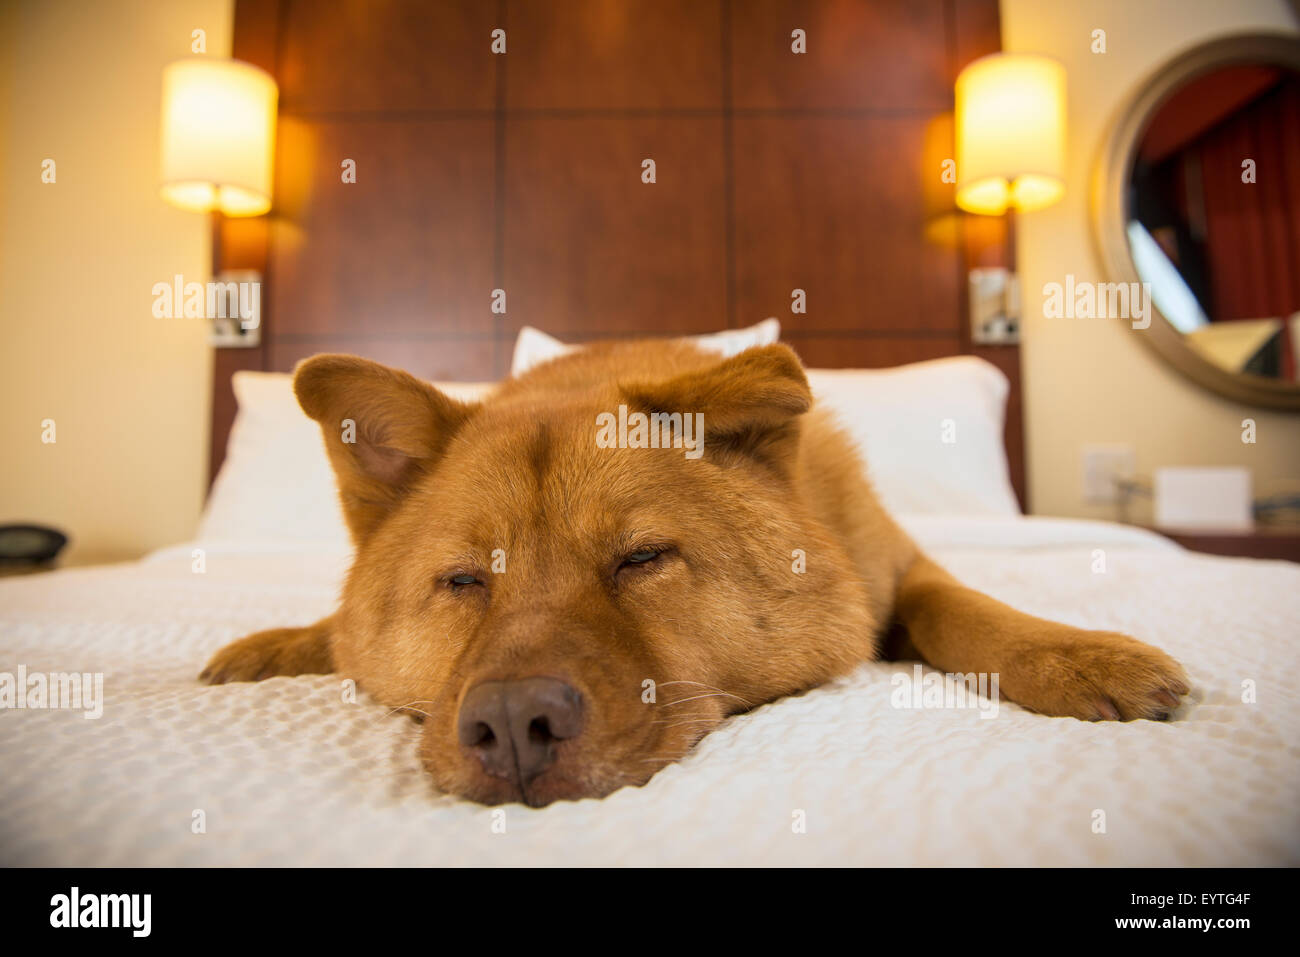 Dog half asleep on bed in hotel room - Stock Image